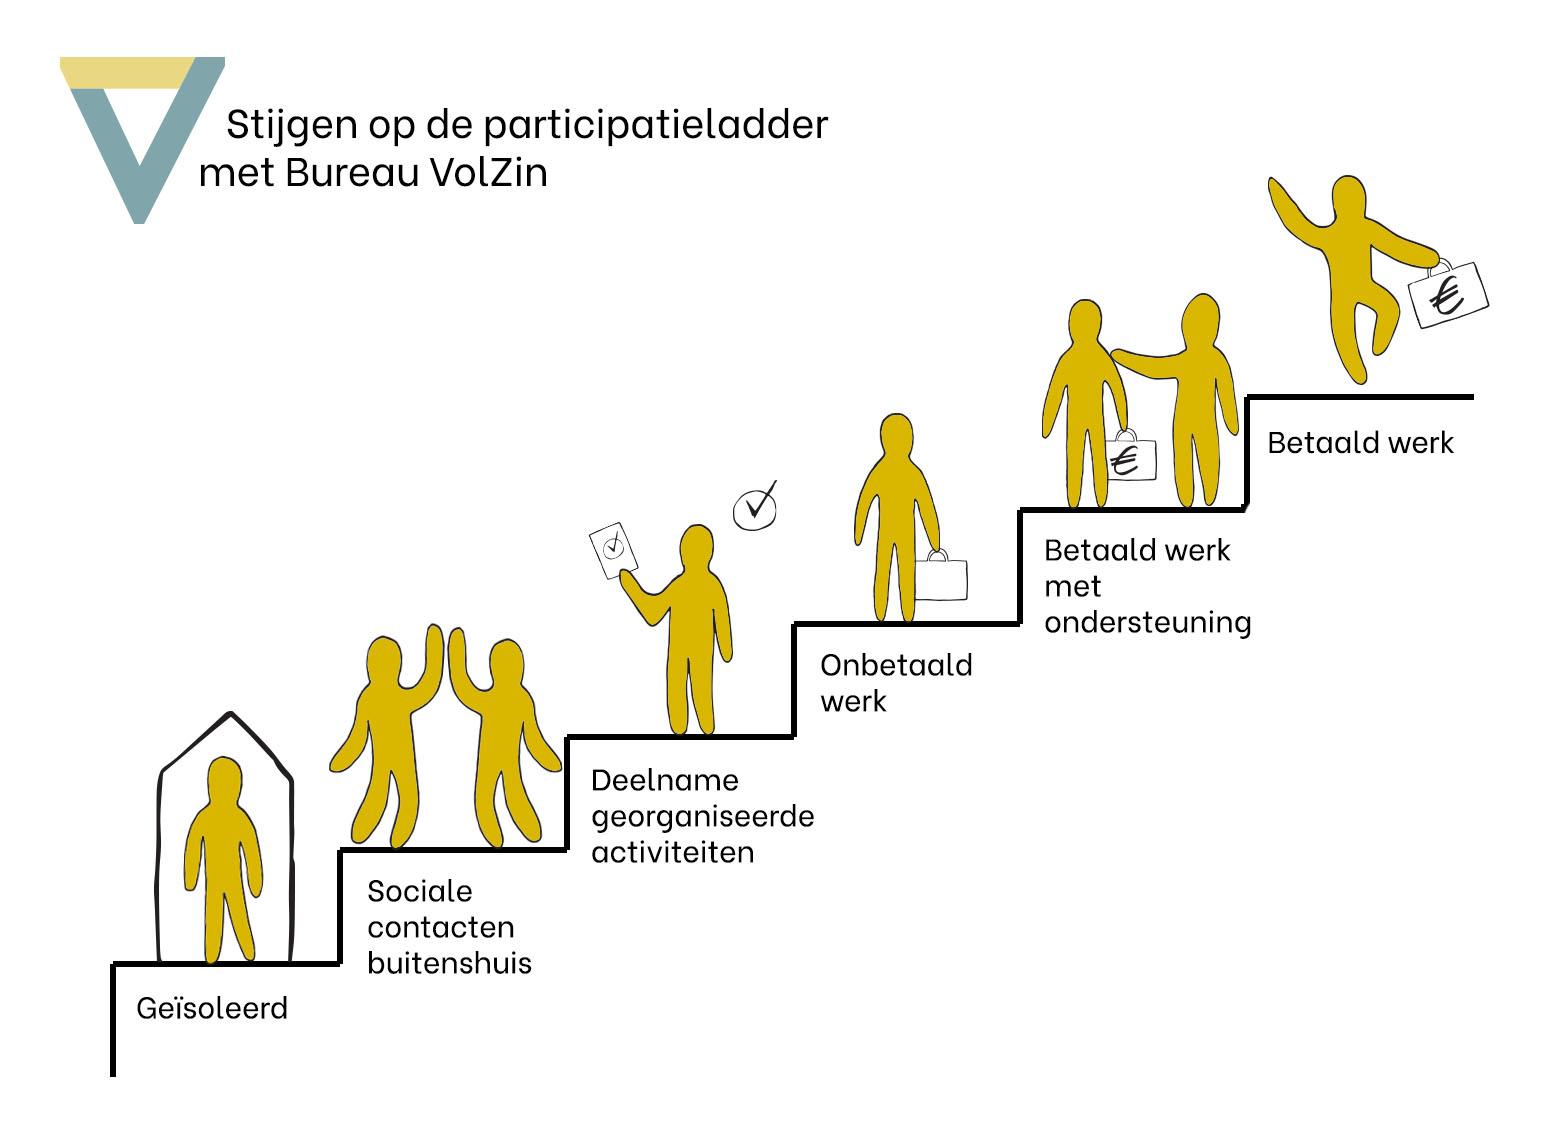 Participatieladder Bureau VolZin